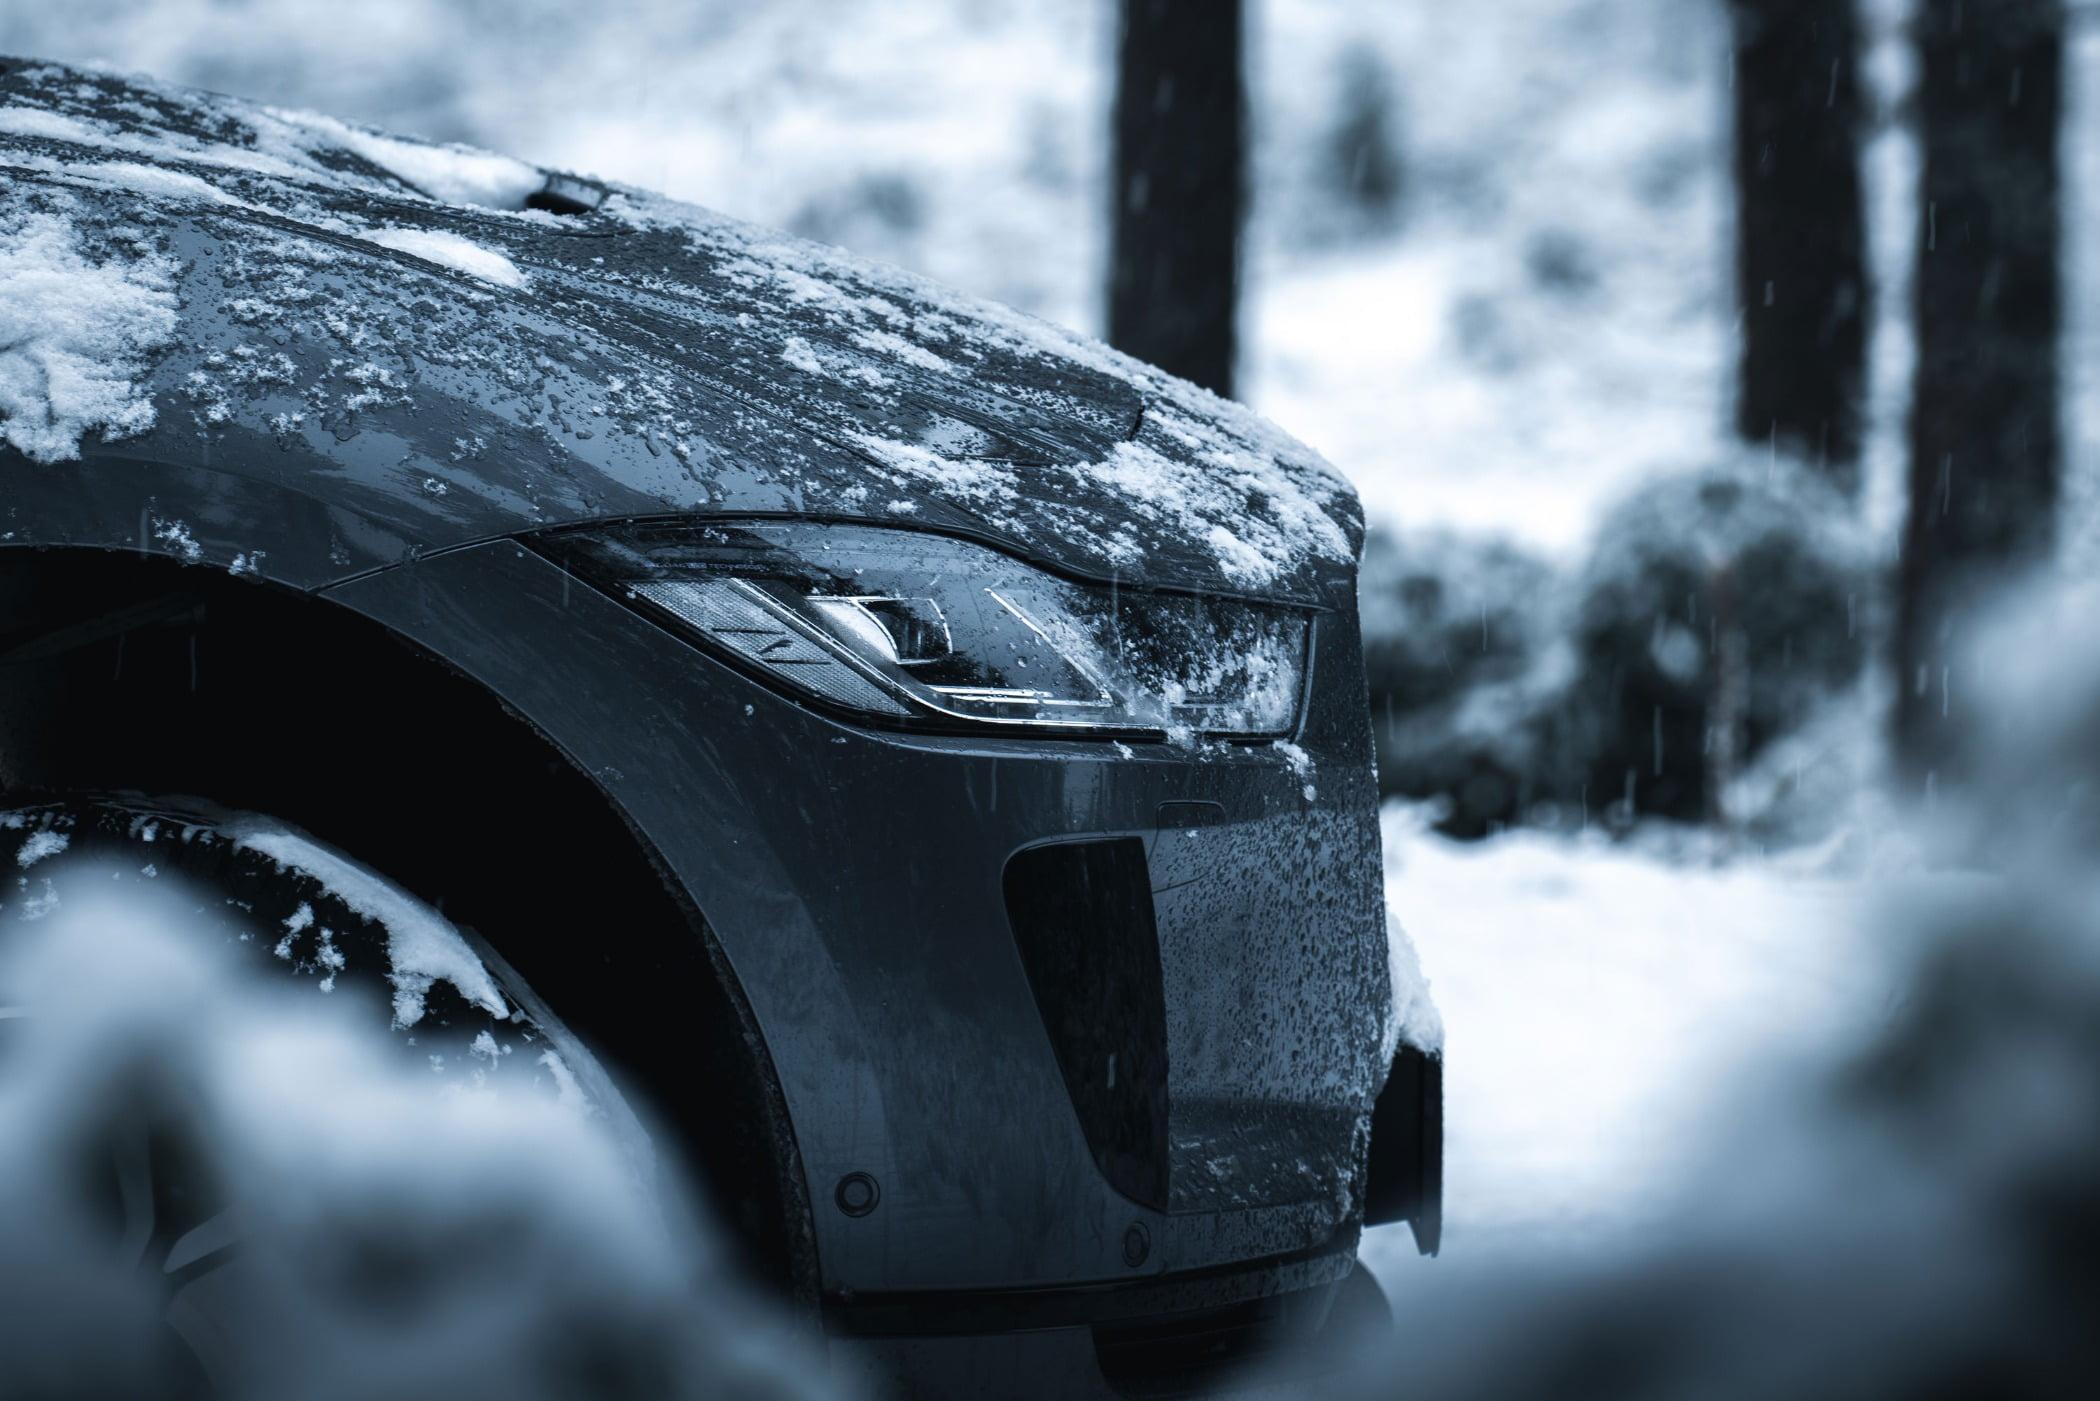 Automotive tire, Motor vehicle, Wheel, Car, Snow, Black, White